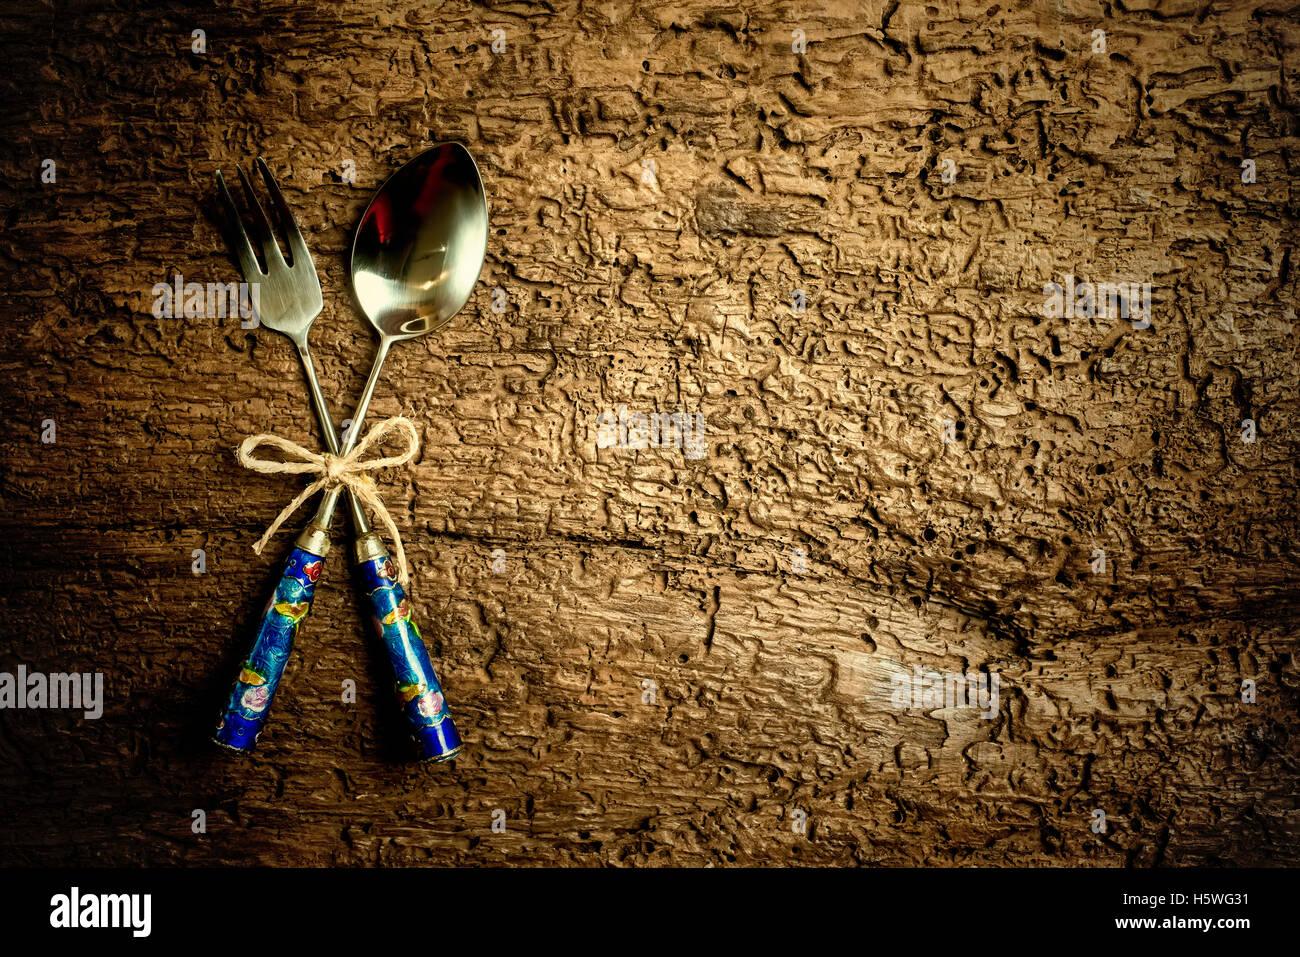 Fall Wooden Wallpaper Menu Background Vintage Set Cutlery On Rustic Wood